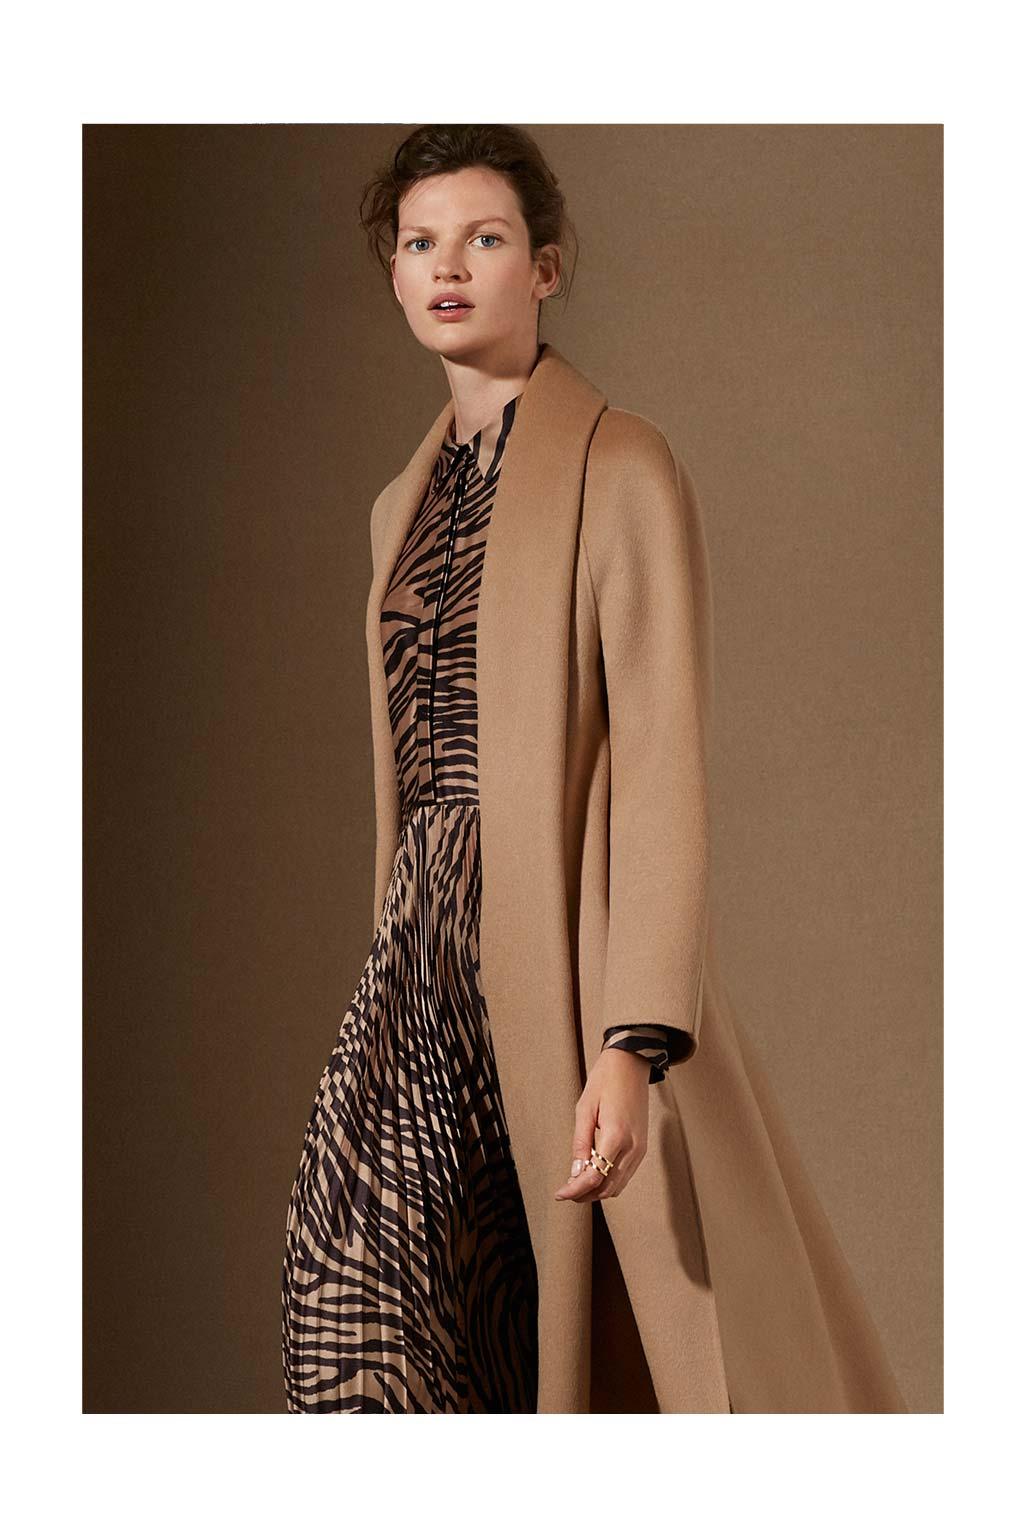 CH Carolina Herrera. New womenswear collection Spotlight. Look 12